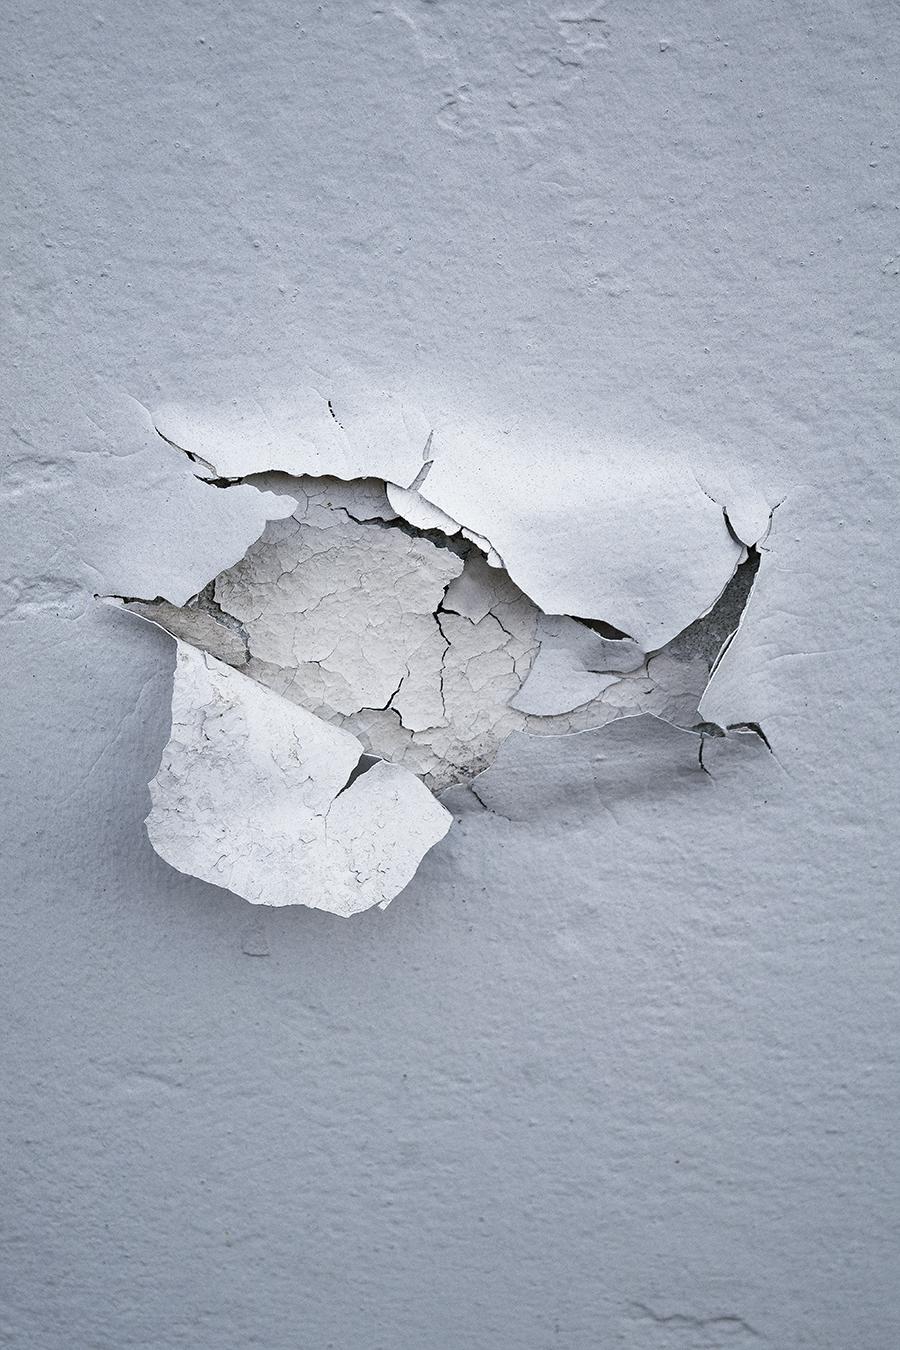 Karen_Liao_still_life_photography_white_layer_wall_fractured_broken